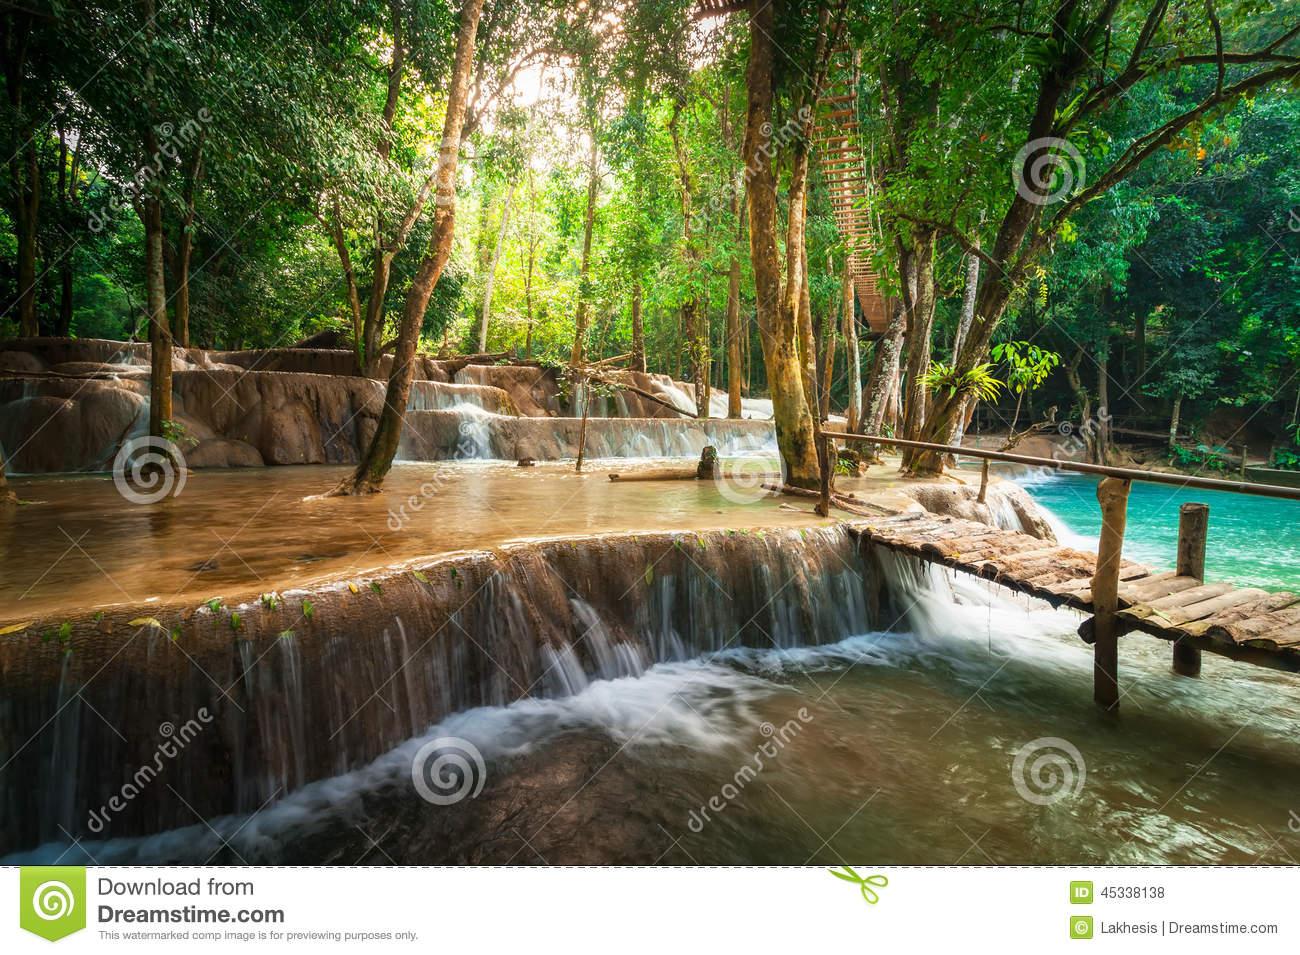 Kuang Si Waterfall clipart #8, Download drawings